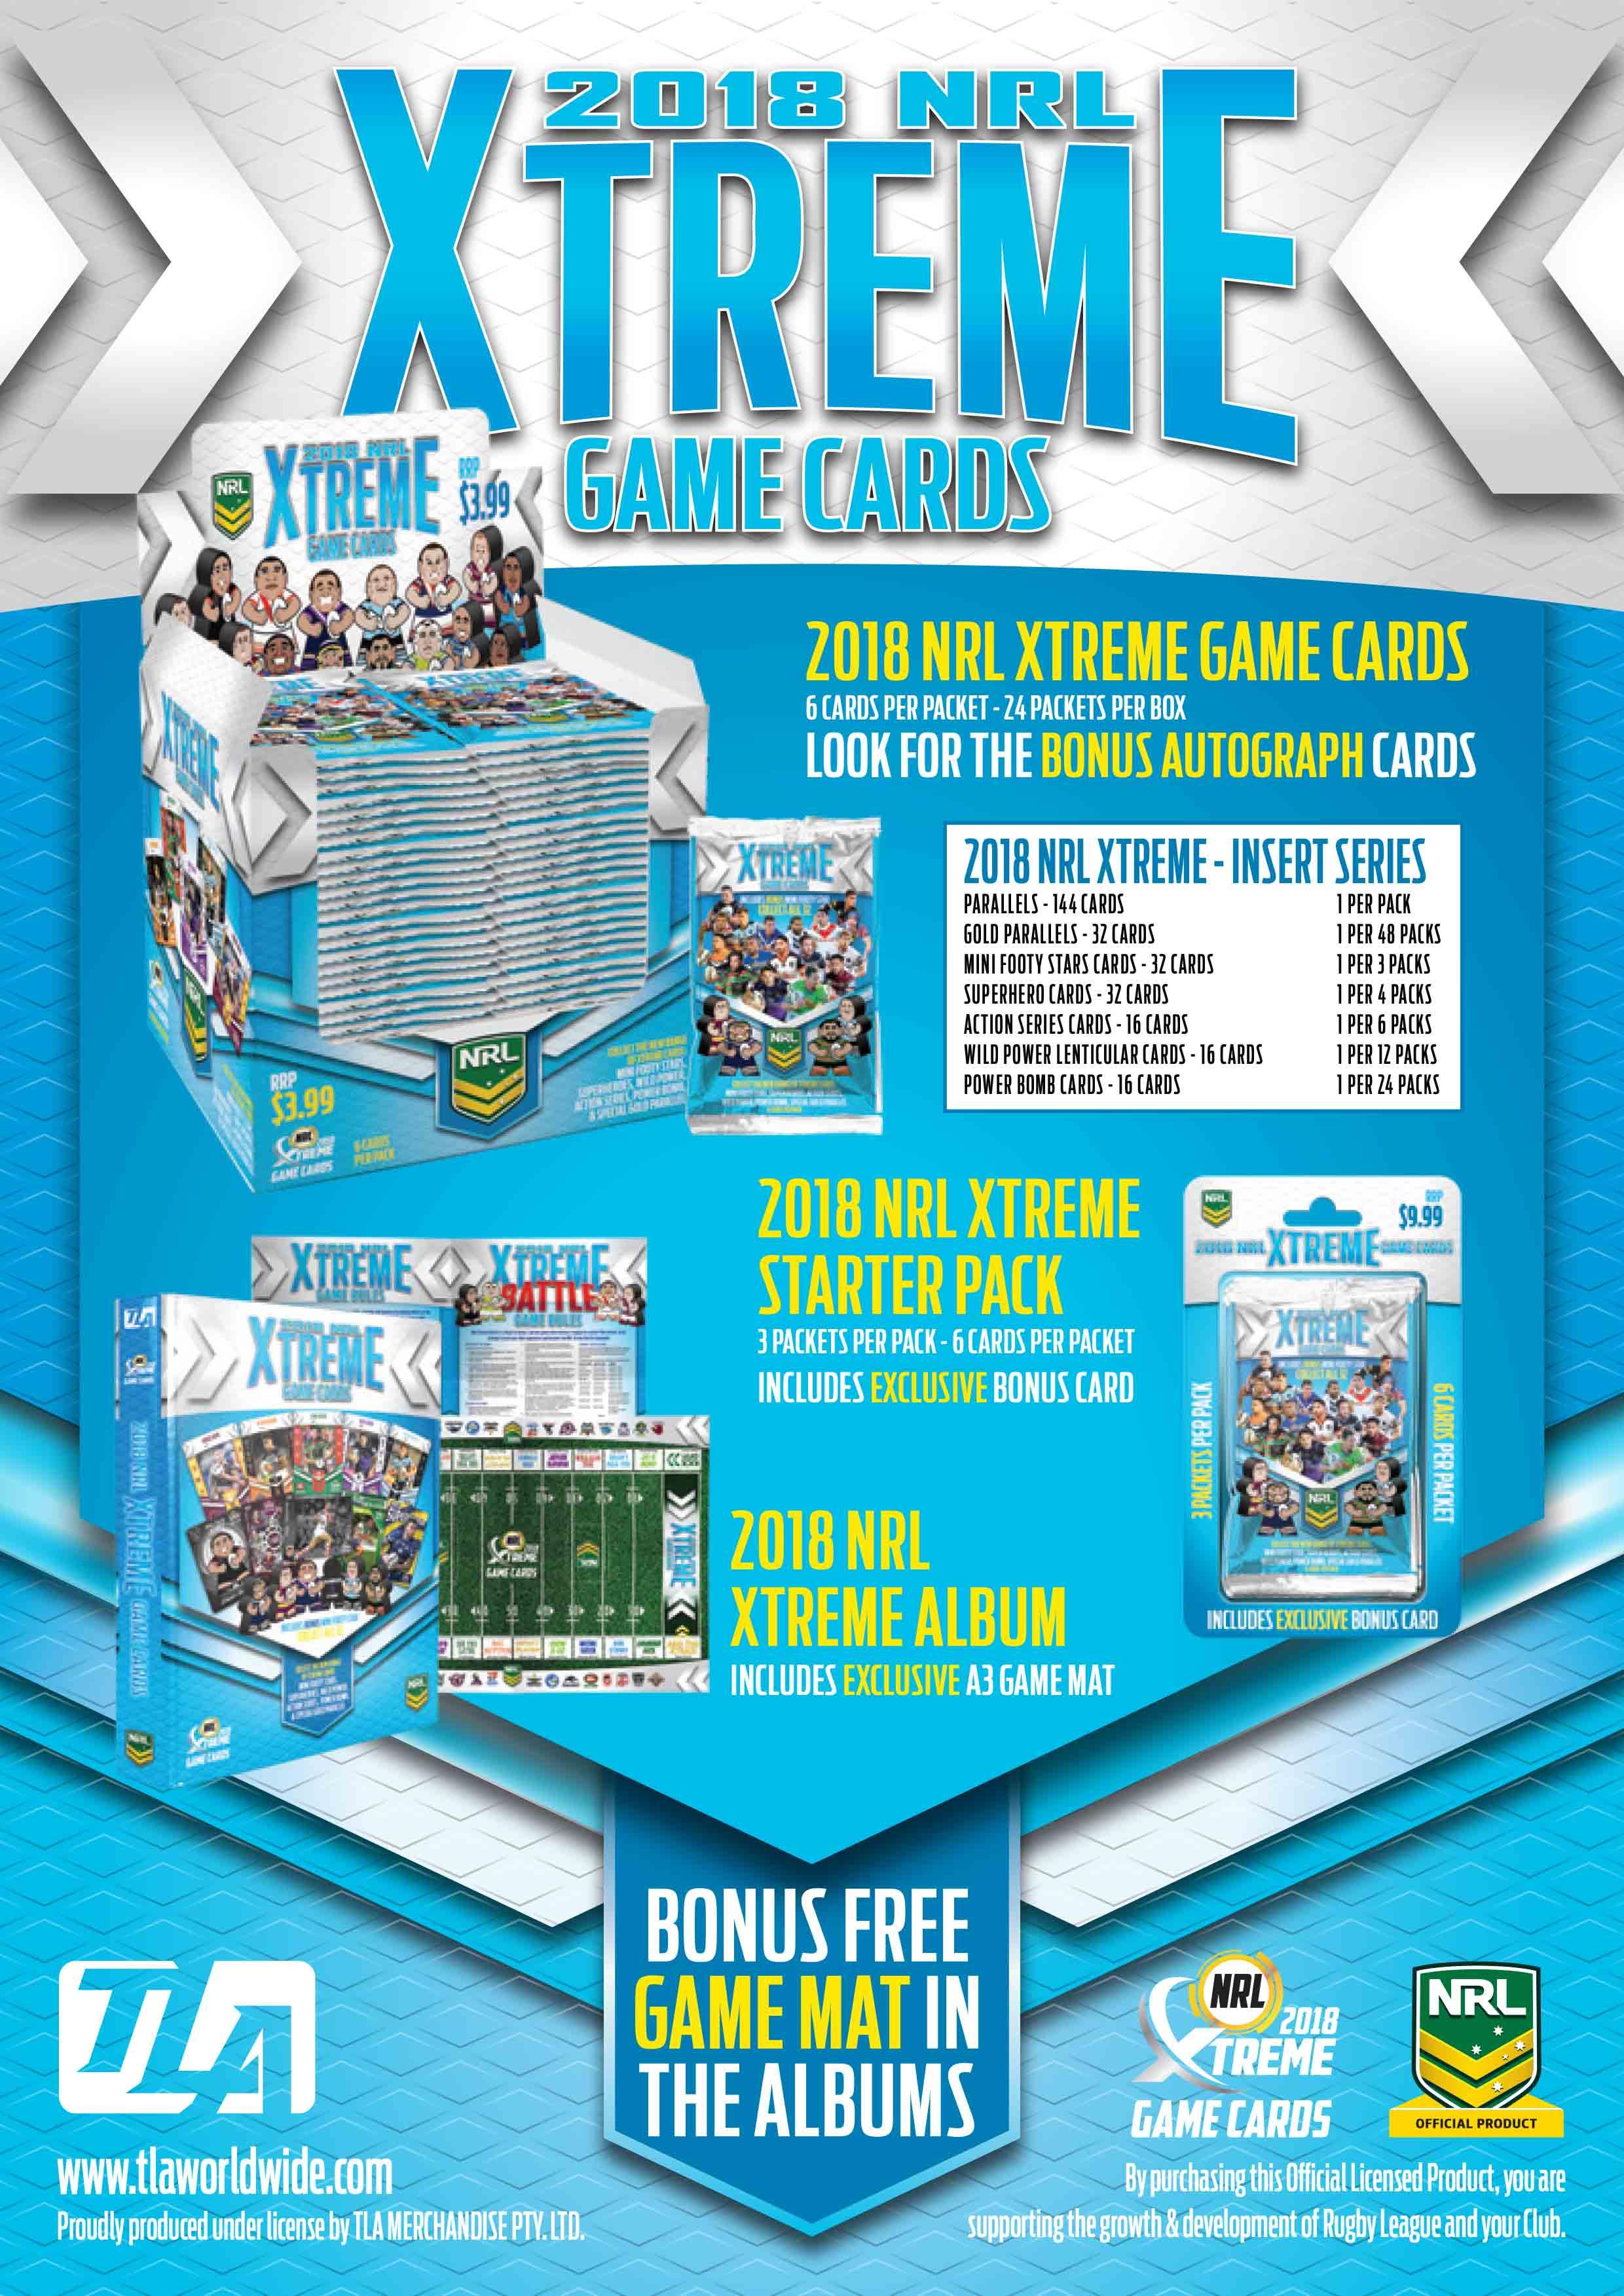 2018 NRL Xtreme Game Cards Sale Flyer